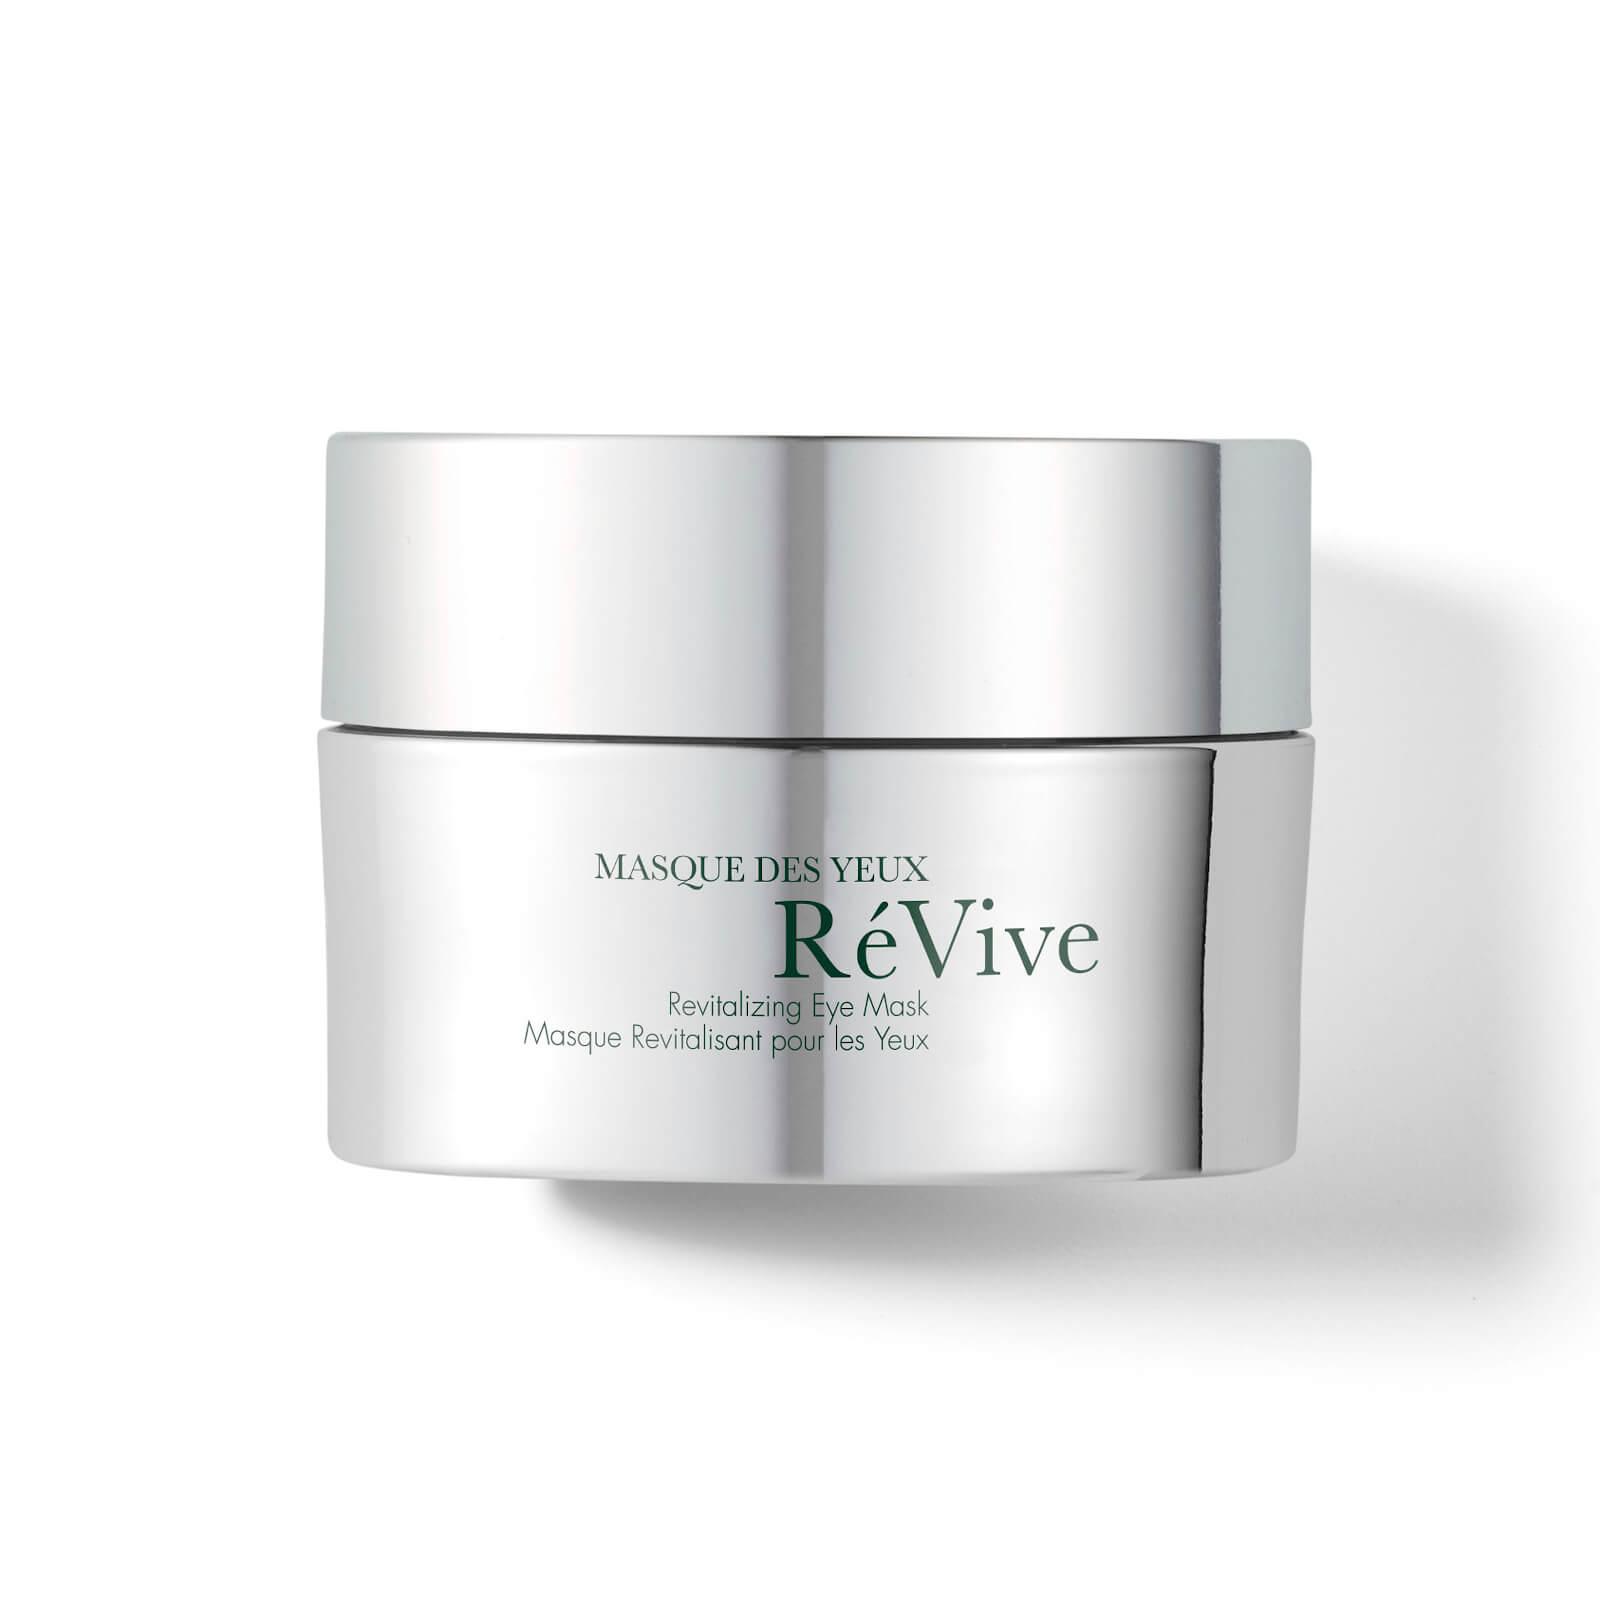 RéVive Masque Des Yeux Revitalizing Eye Mask 30ml